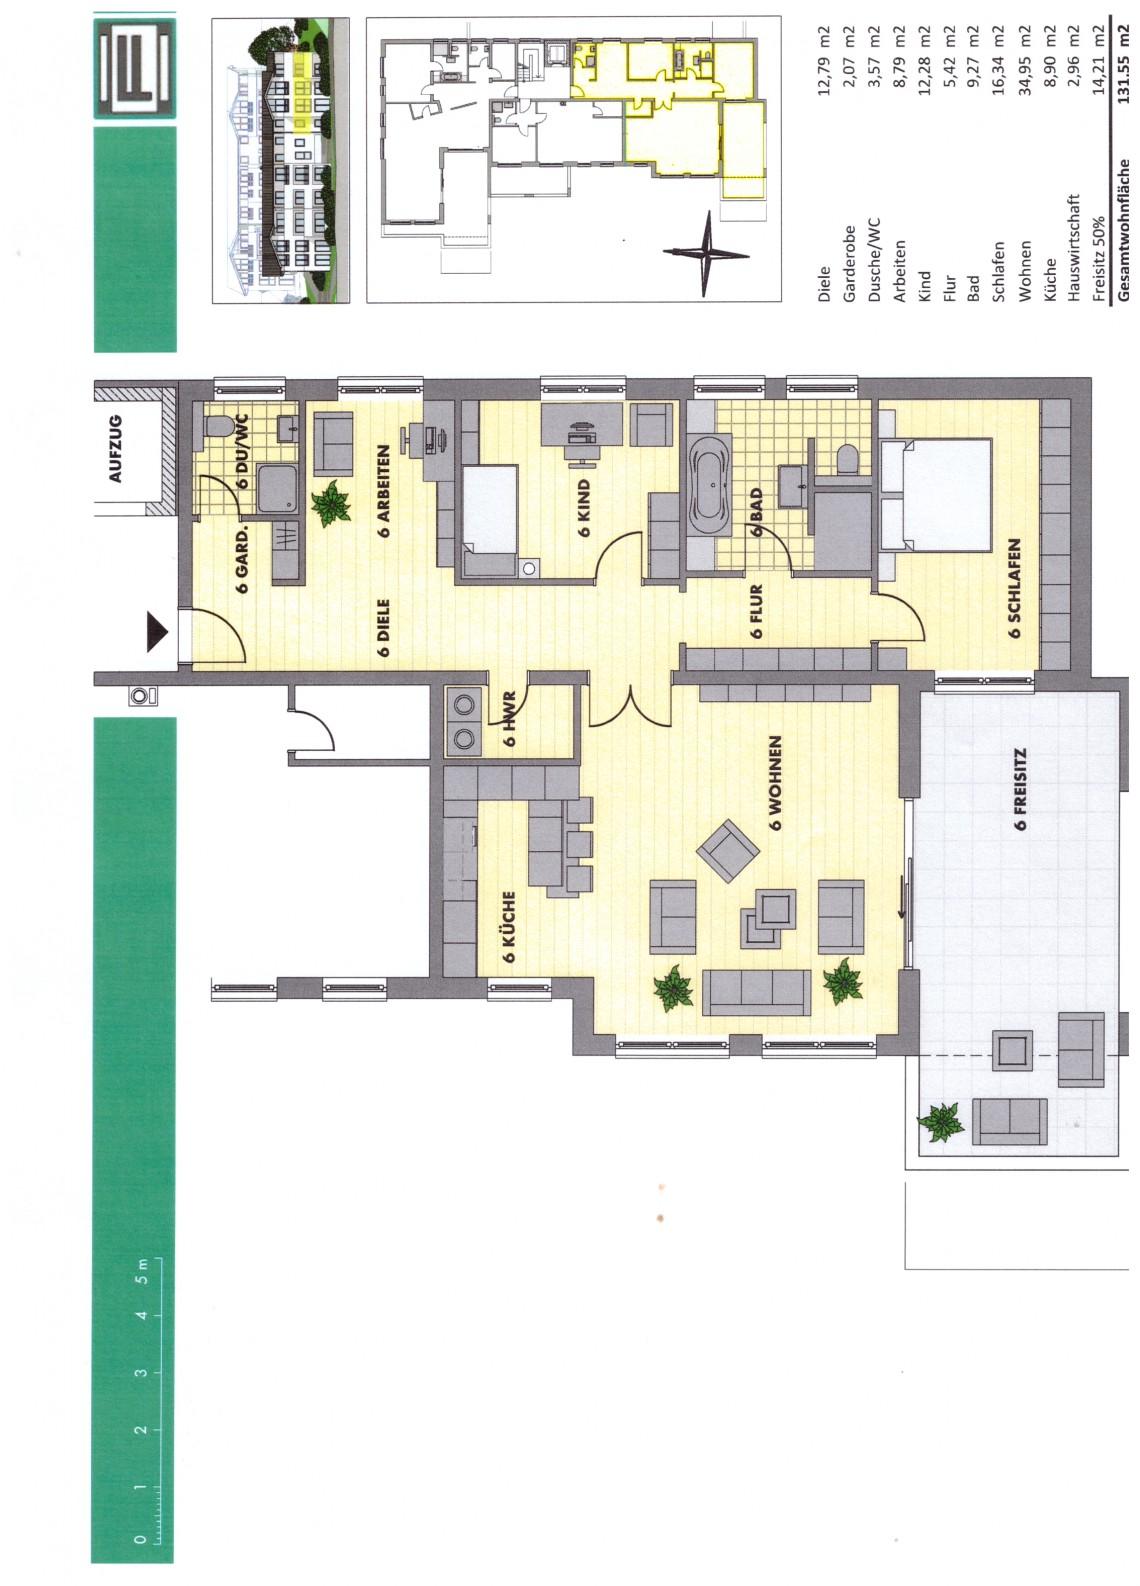 Haus 1 Whg. 6